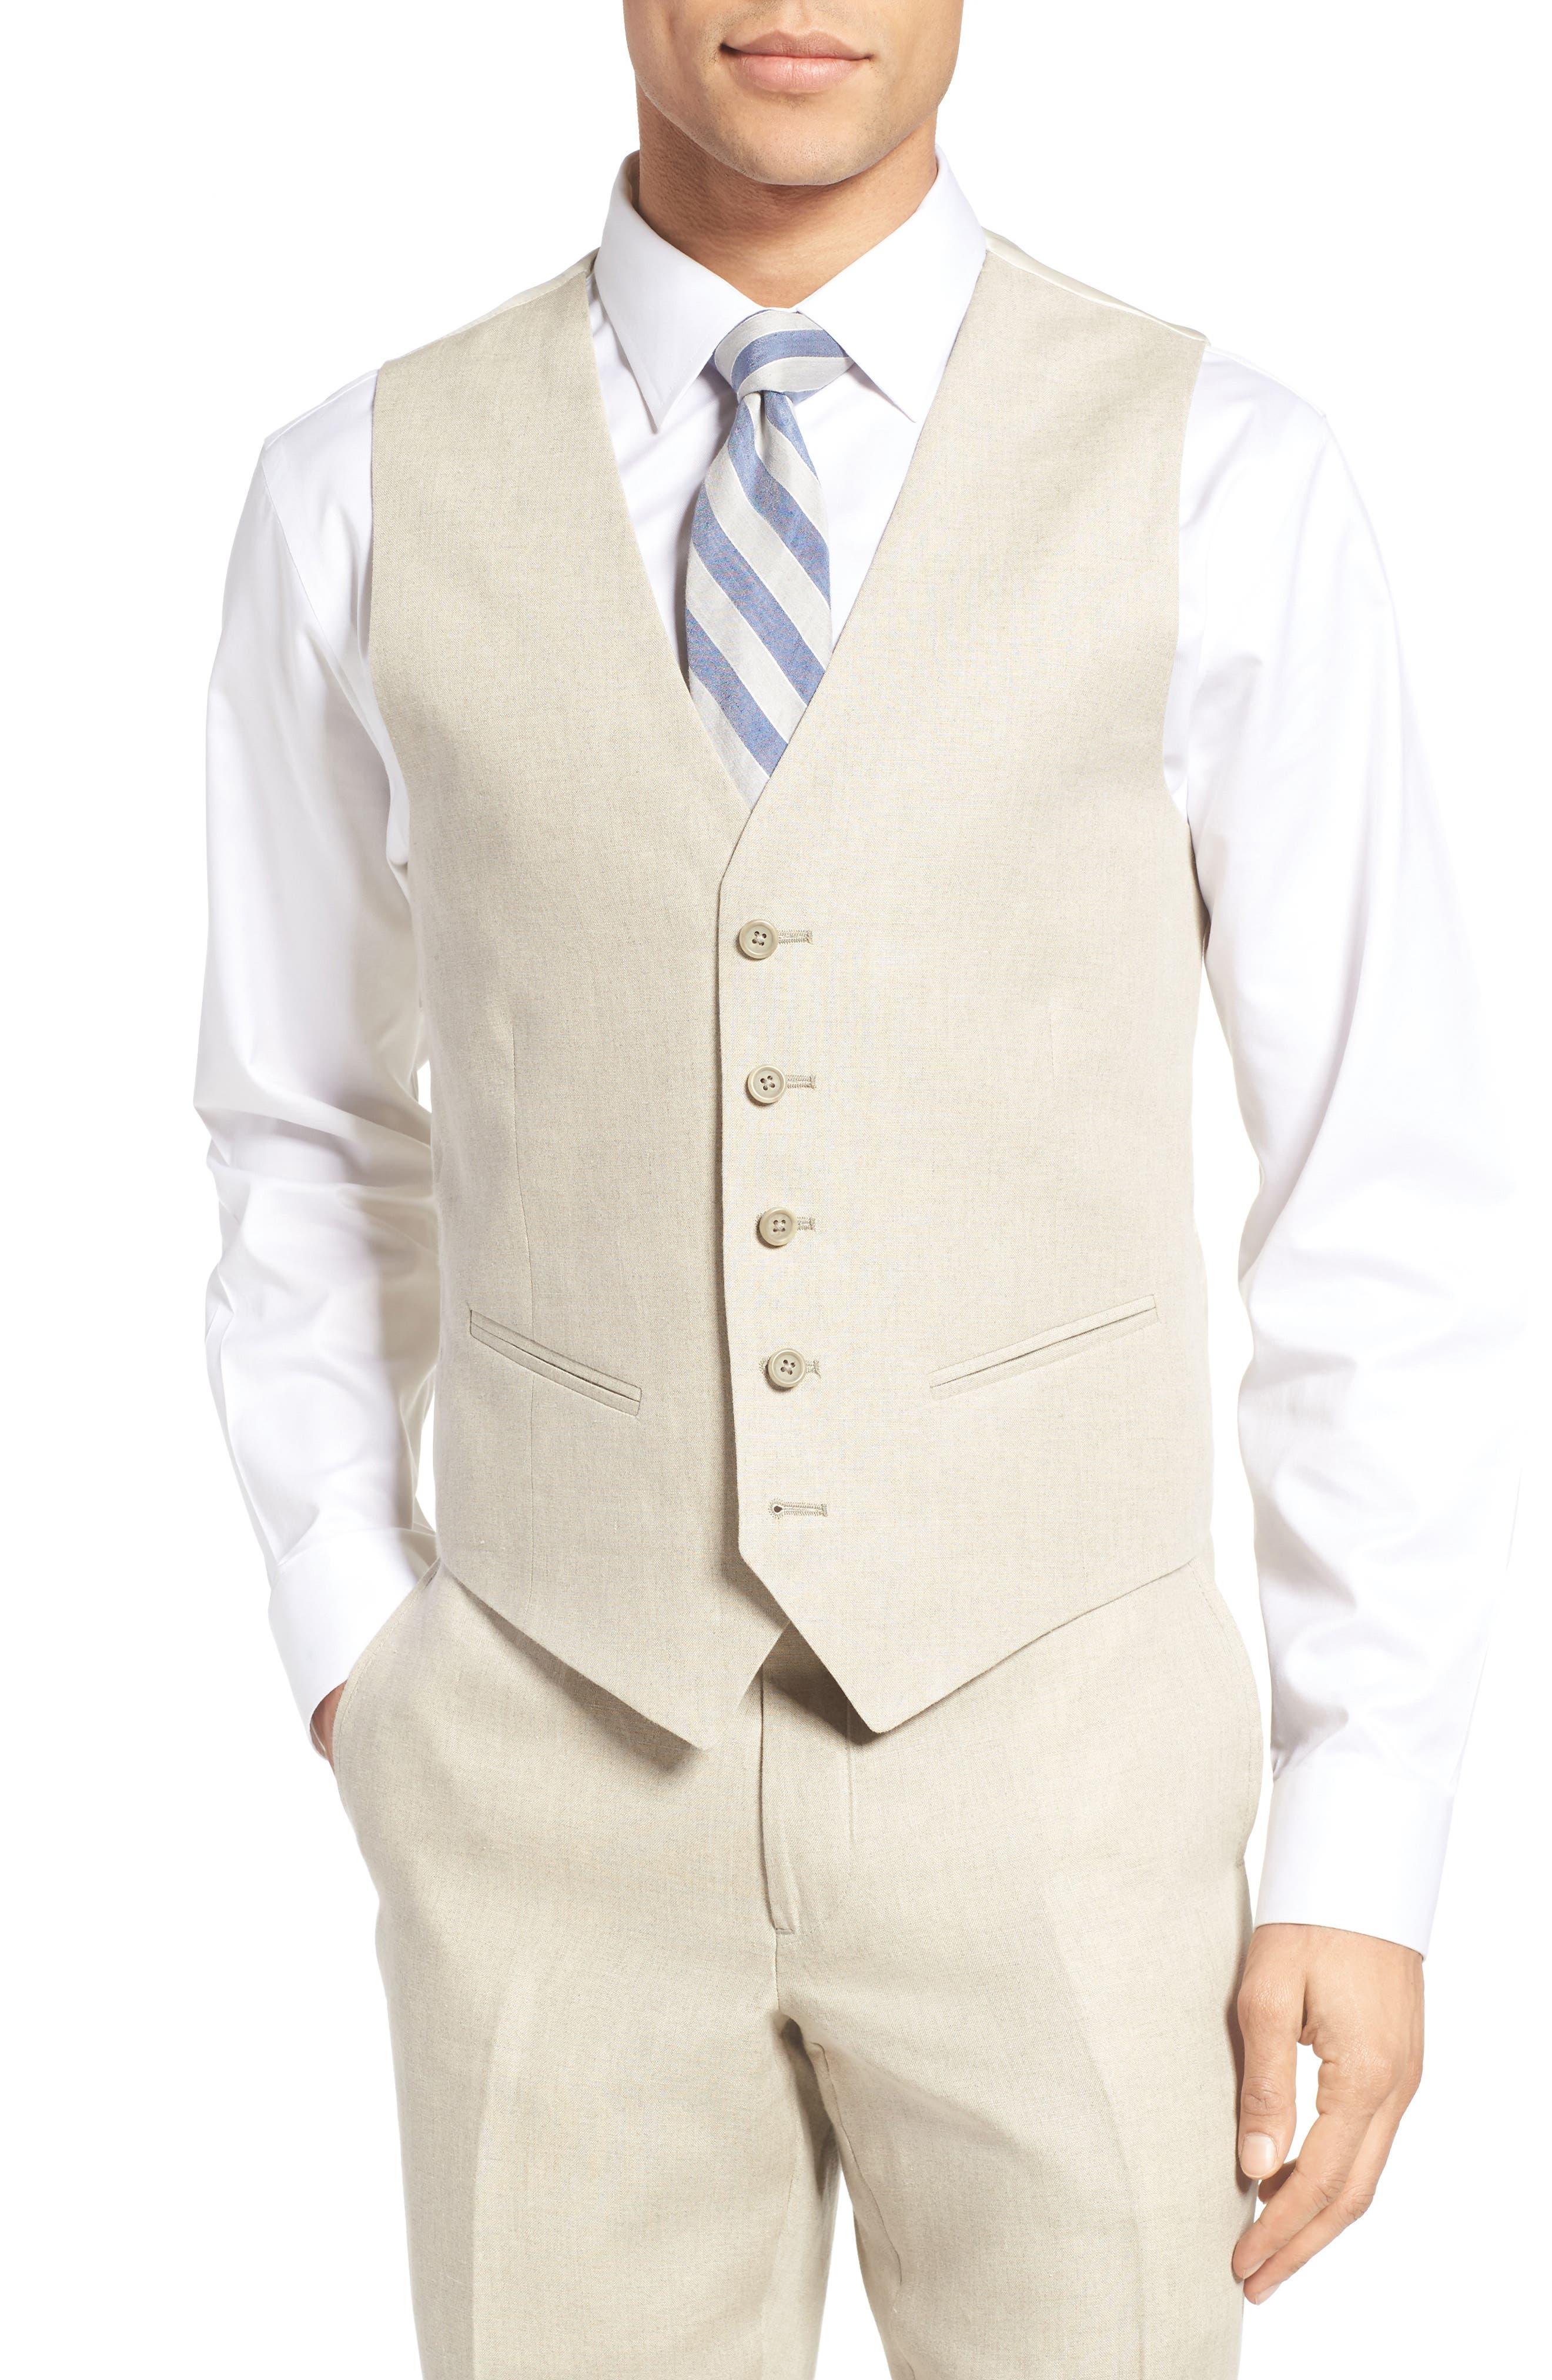 White Formal Vests